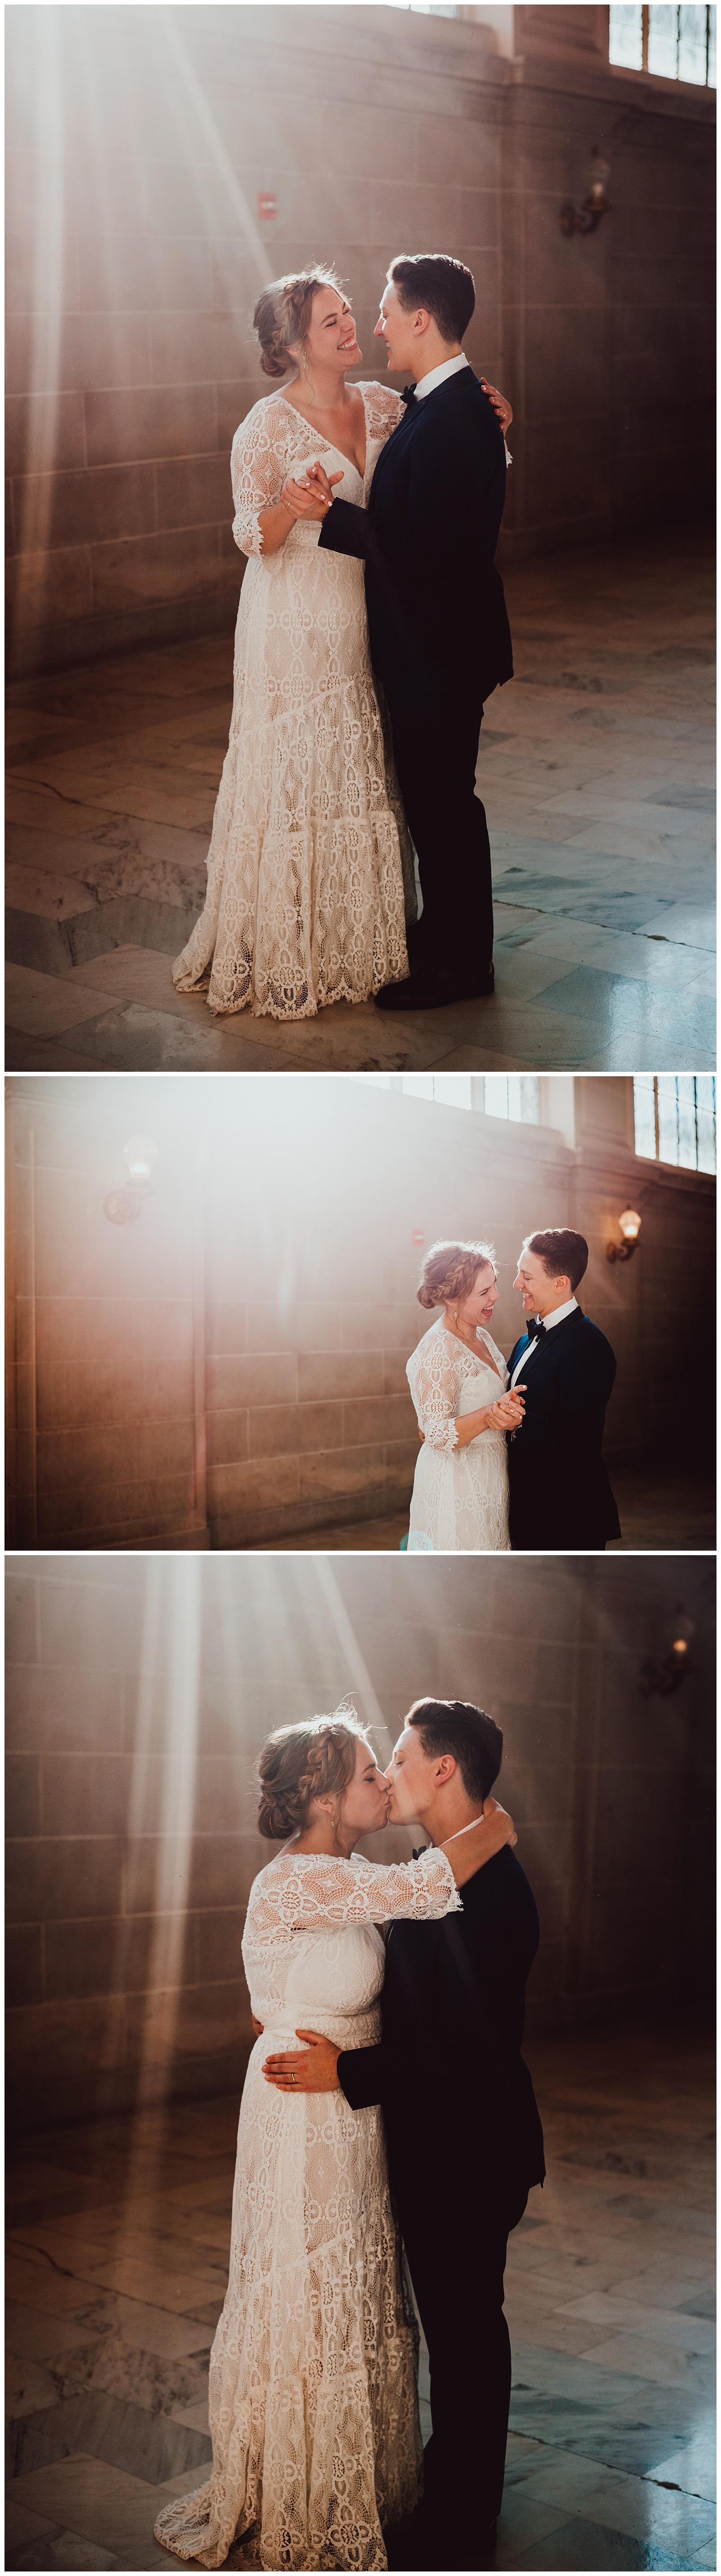 intimateLGBTQsanfranciscowedding12_StudioXIIIPhotography